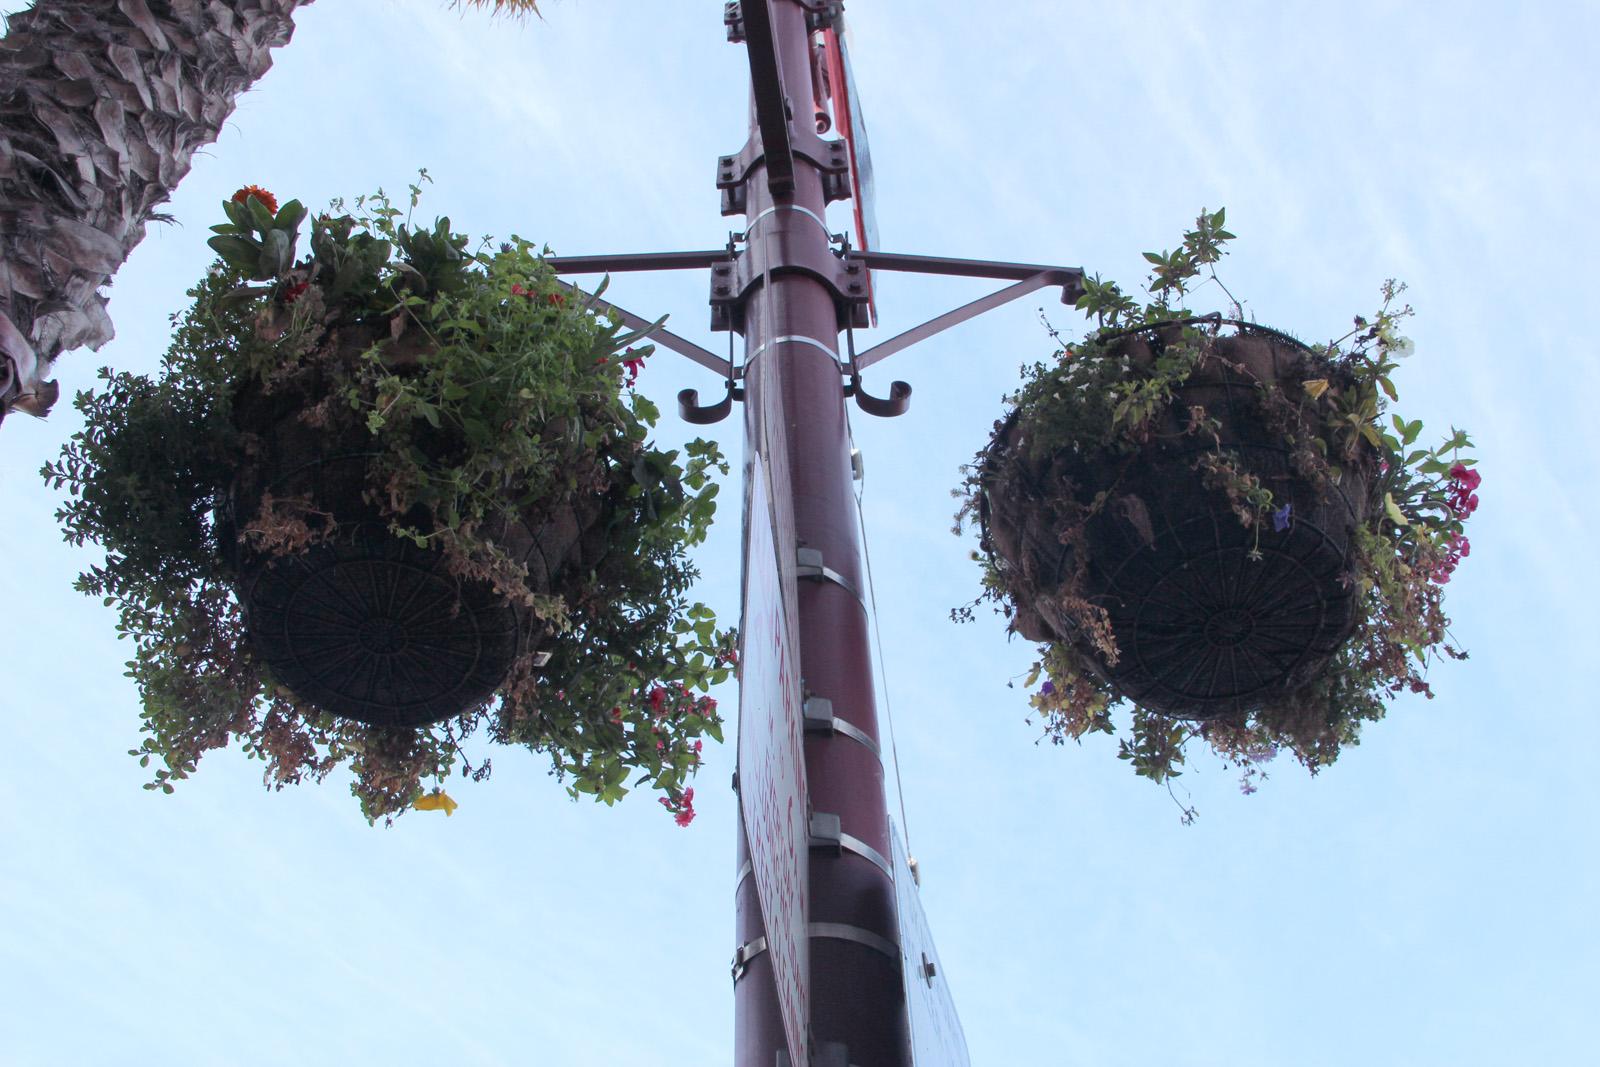 Hanging plant pots on Mission St.